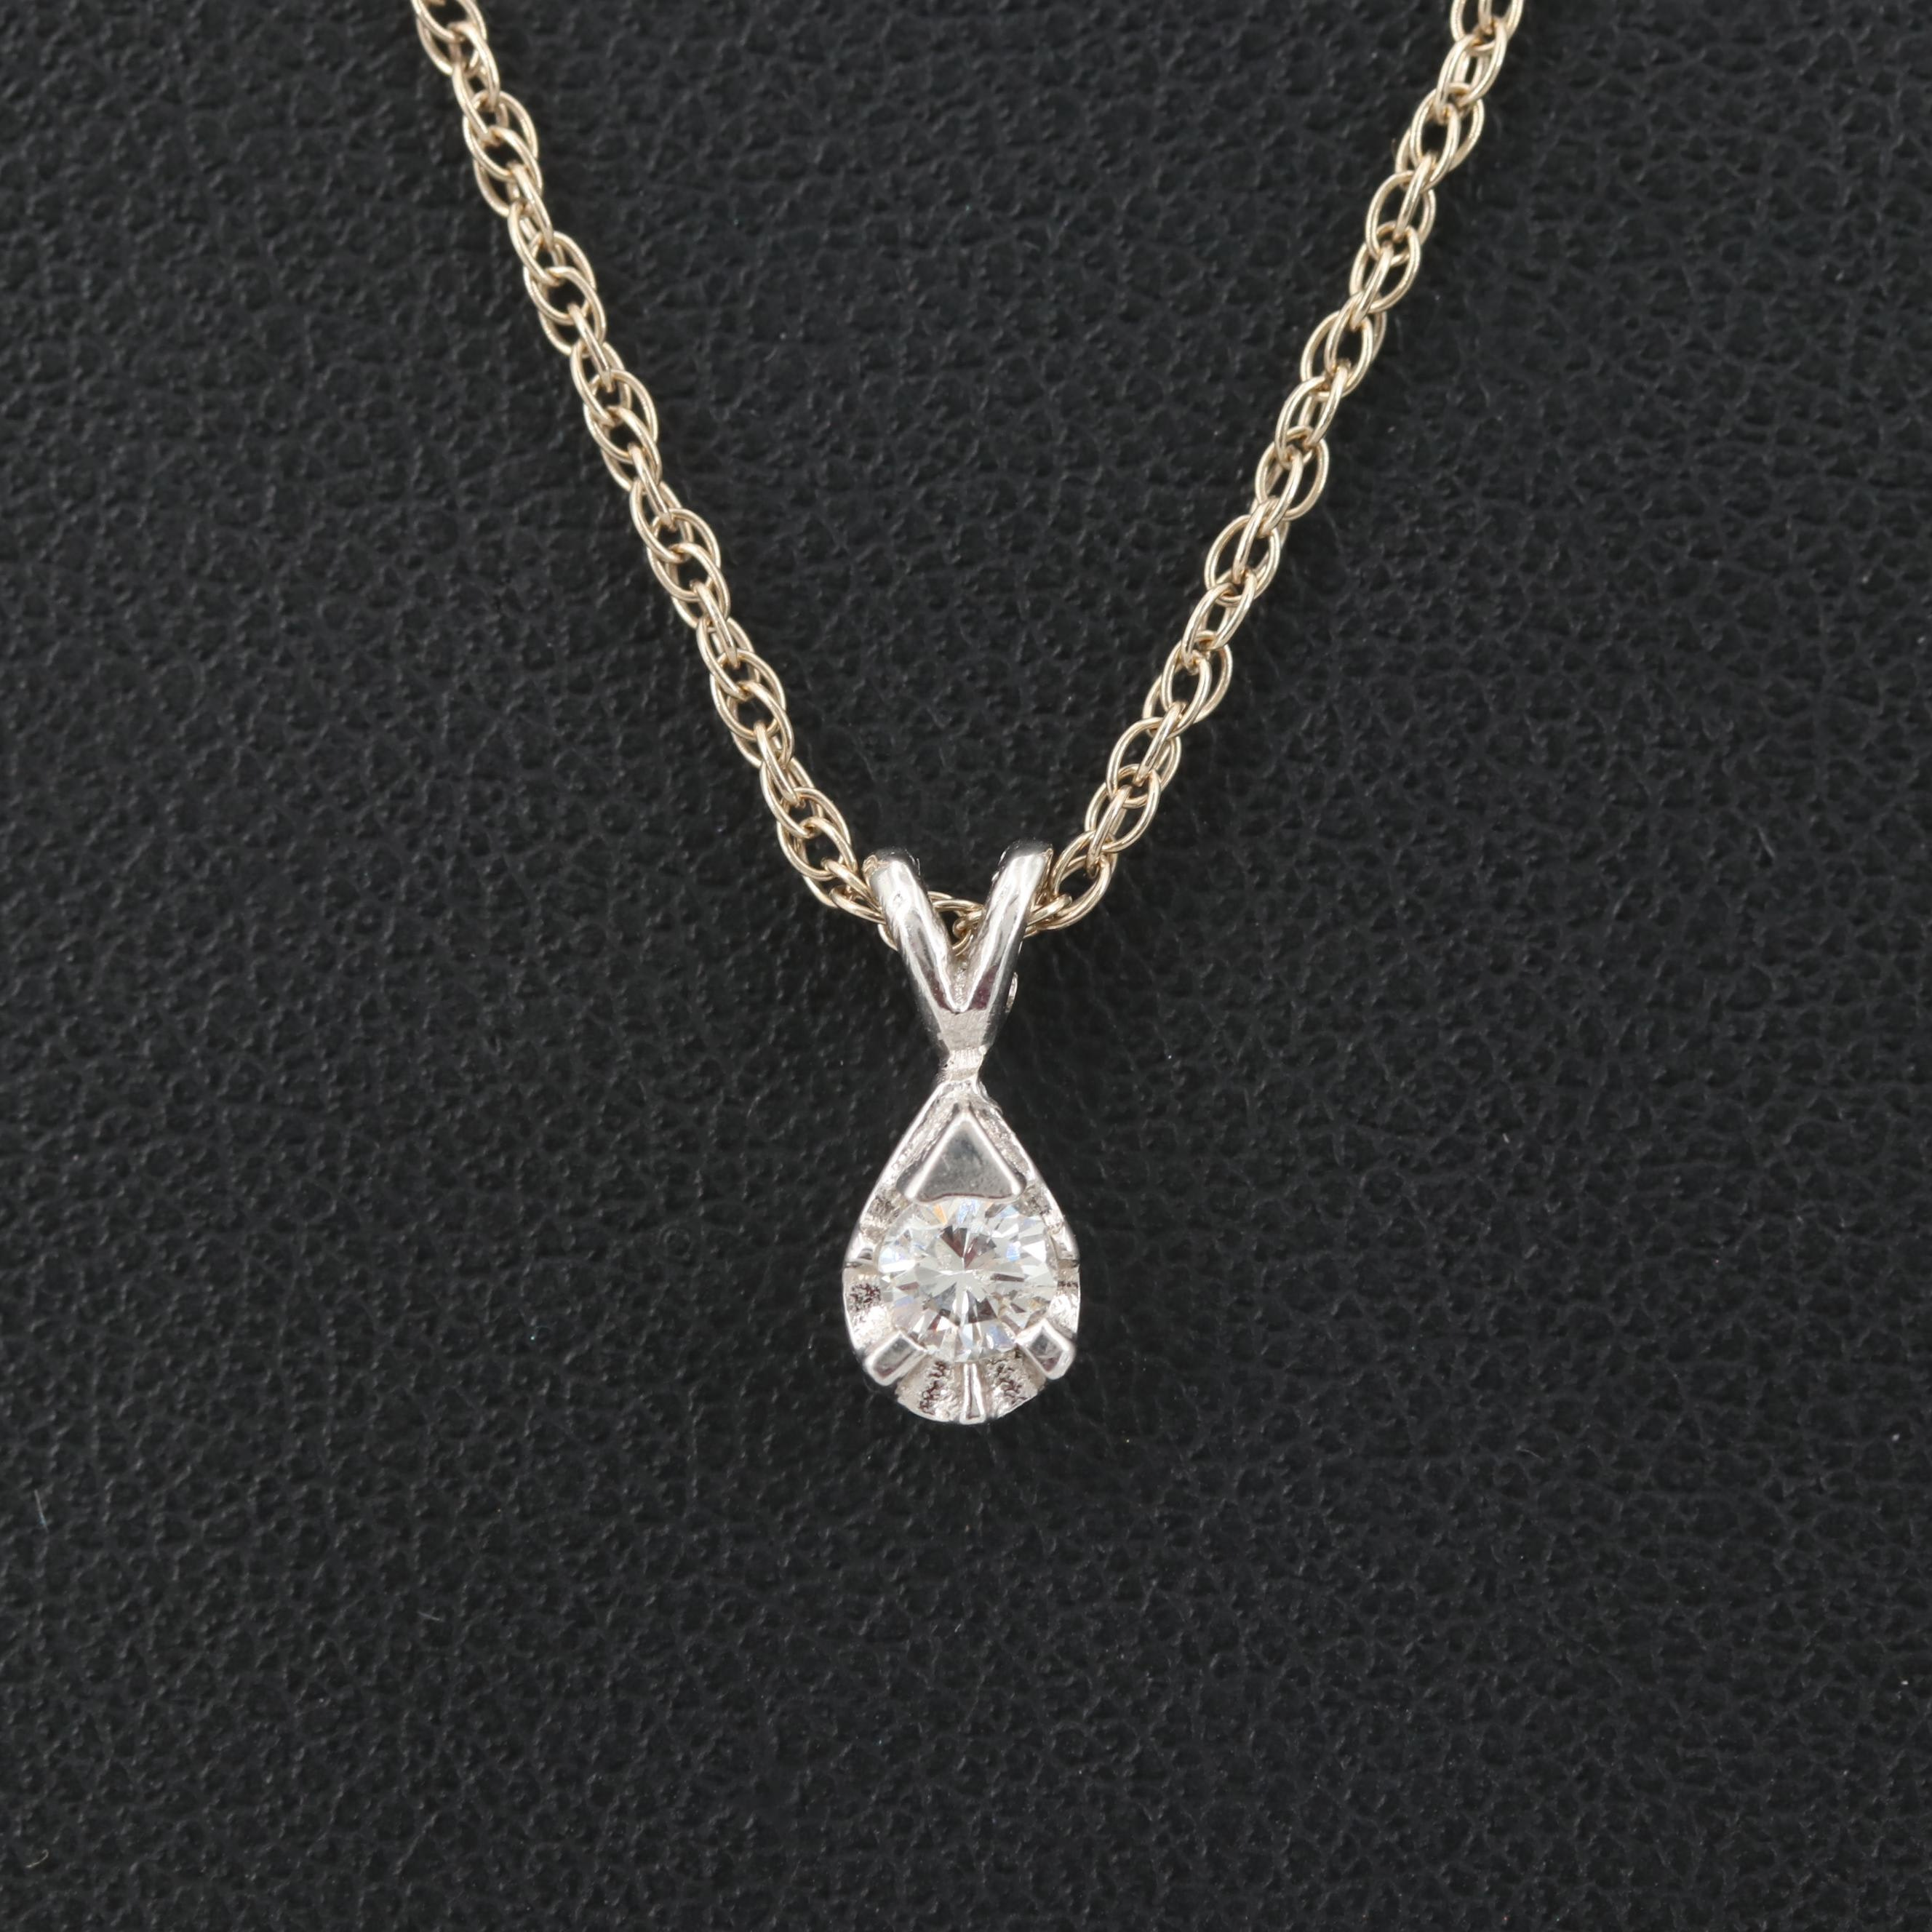 14K White Gold Solitaire Diamond Pendant Necklace